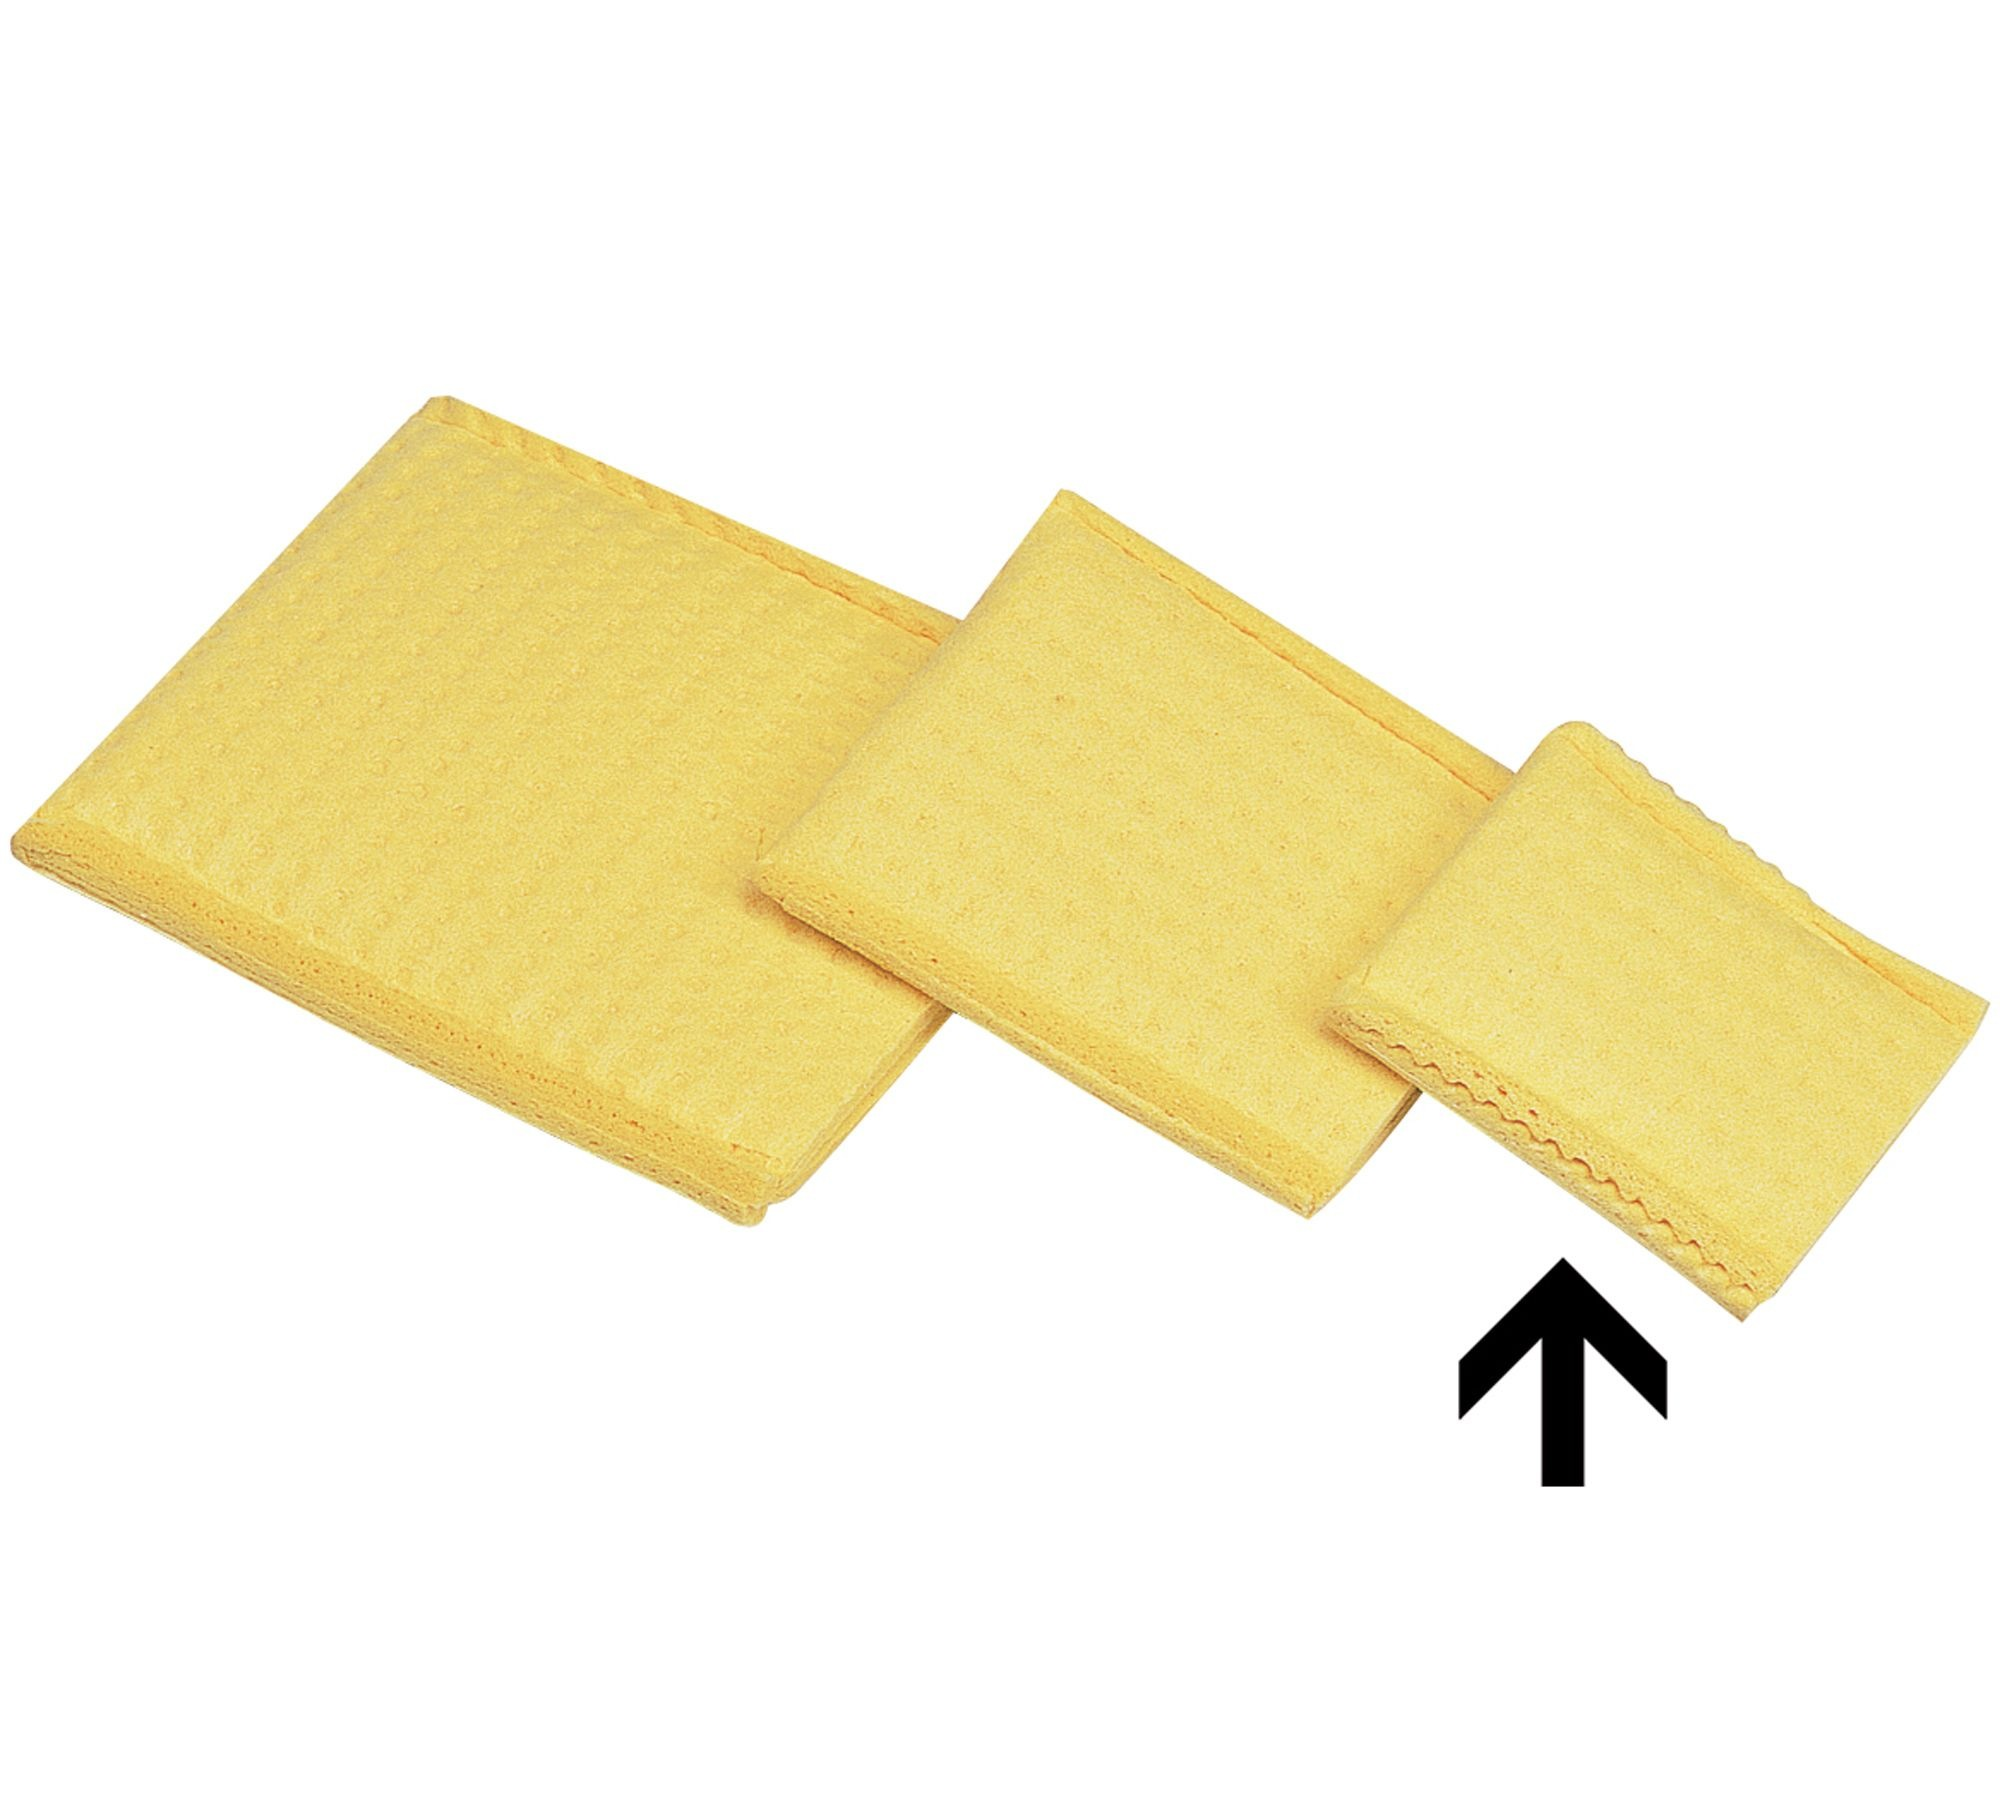 Прокладки увлажняемые вискозные желтые, 4х6 см, 6х8 см, 8х12 см